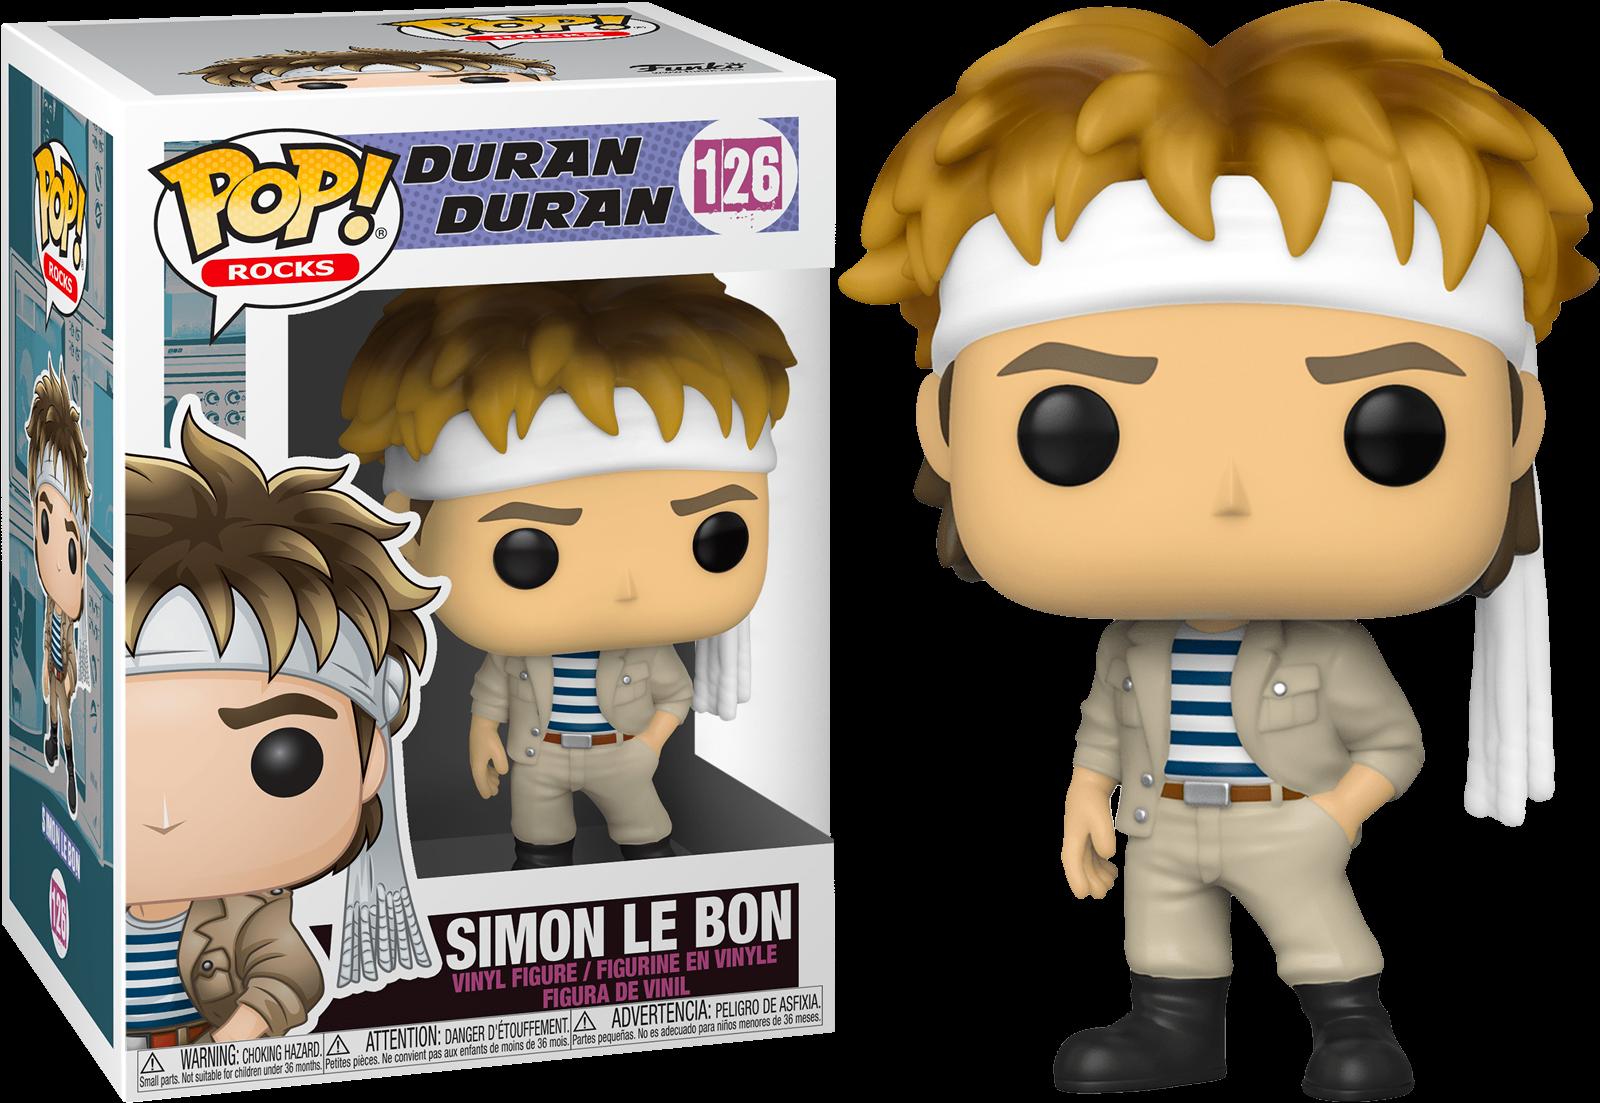 Duran Duran POP! Rocks Vinyl Figure Simon Le Bon 9 cm